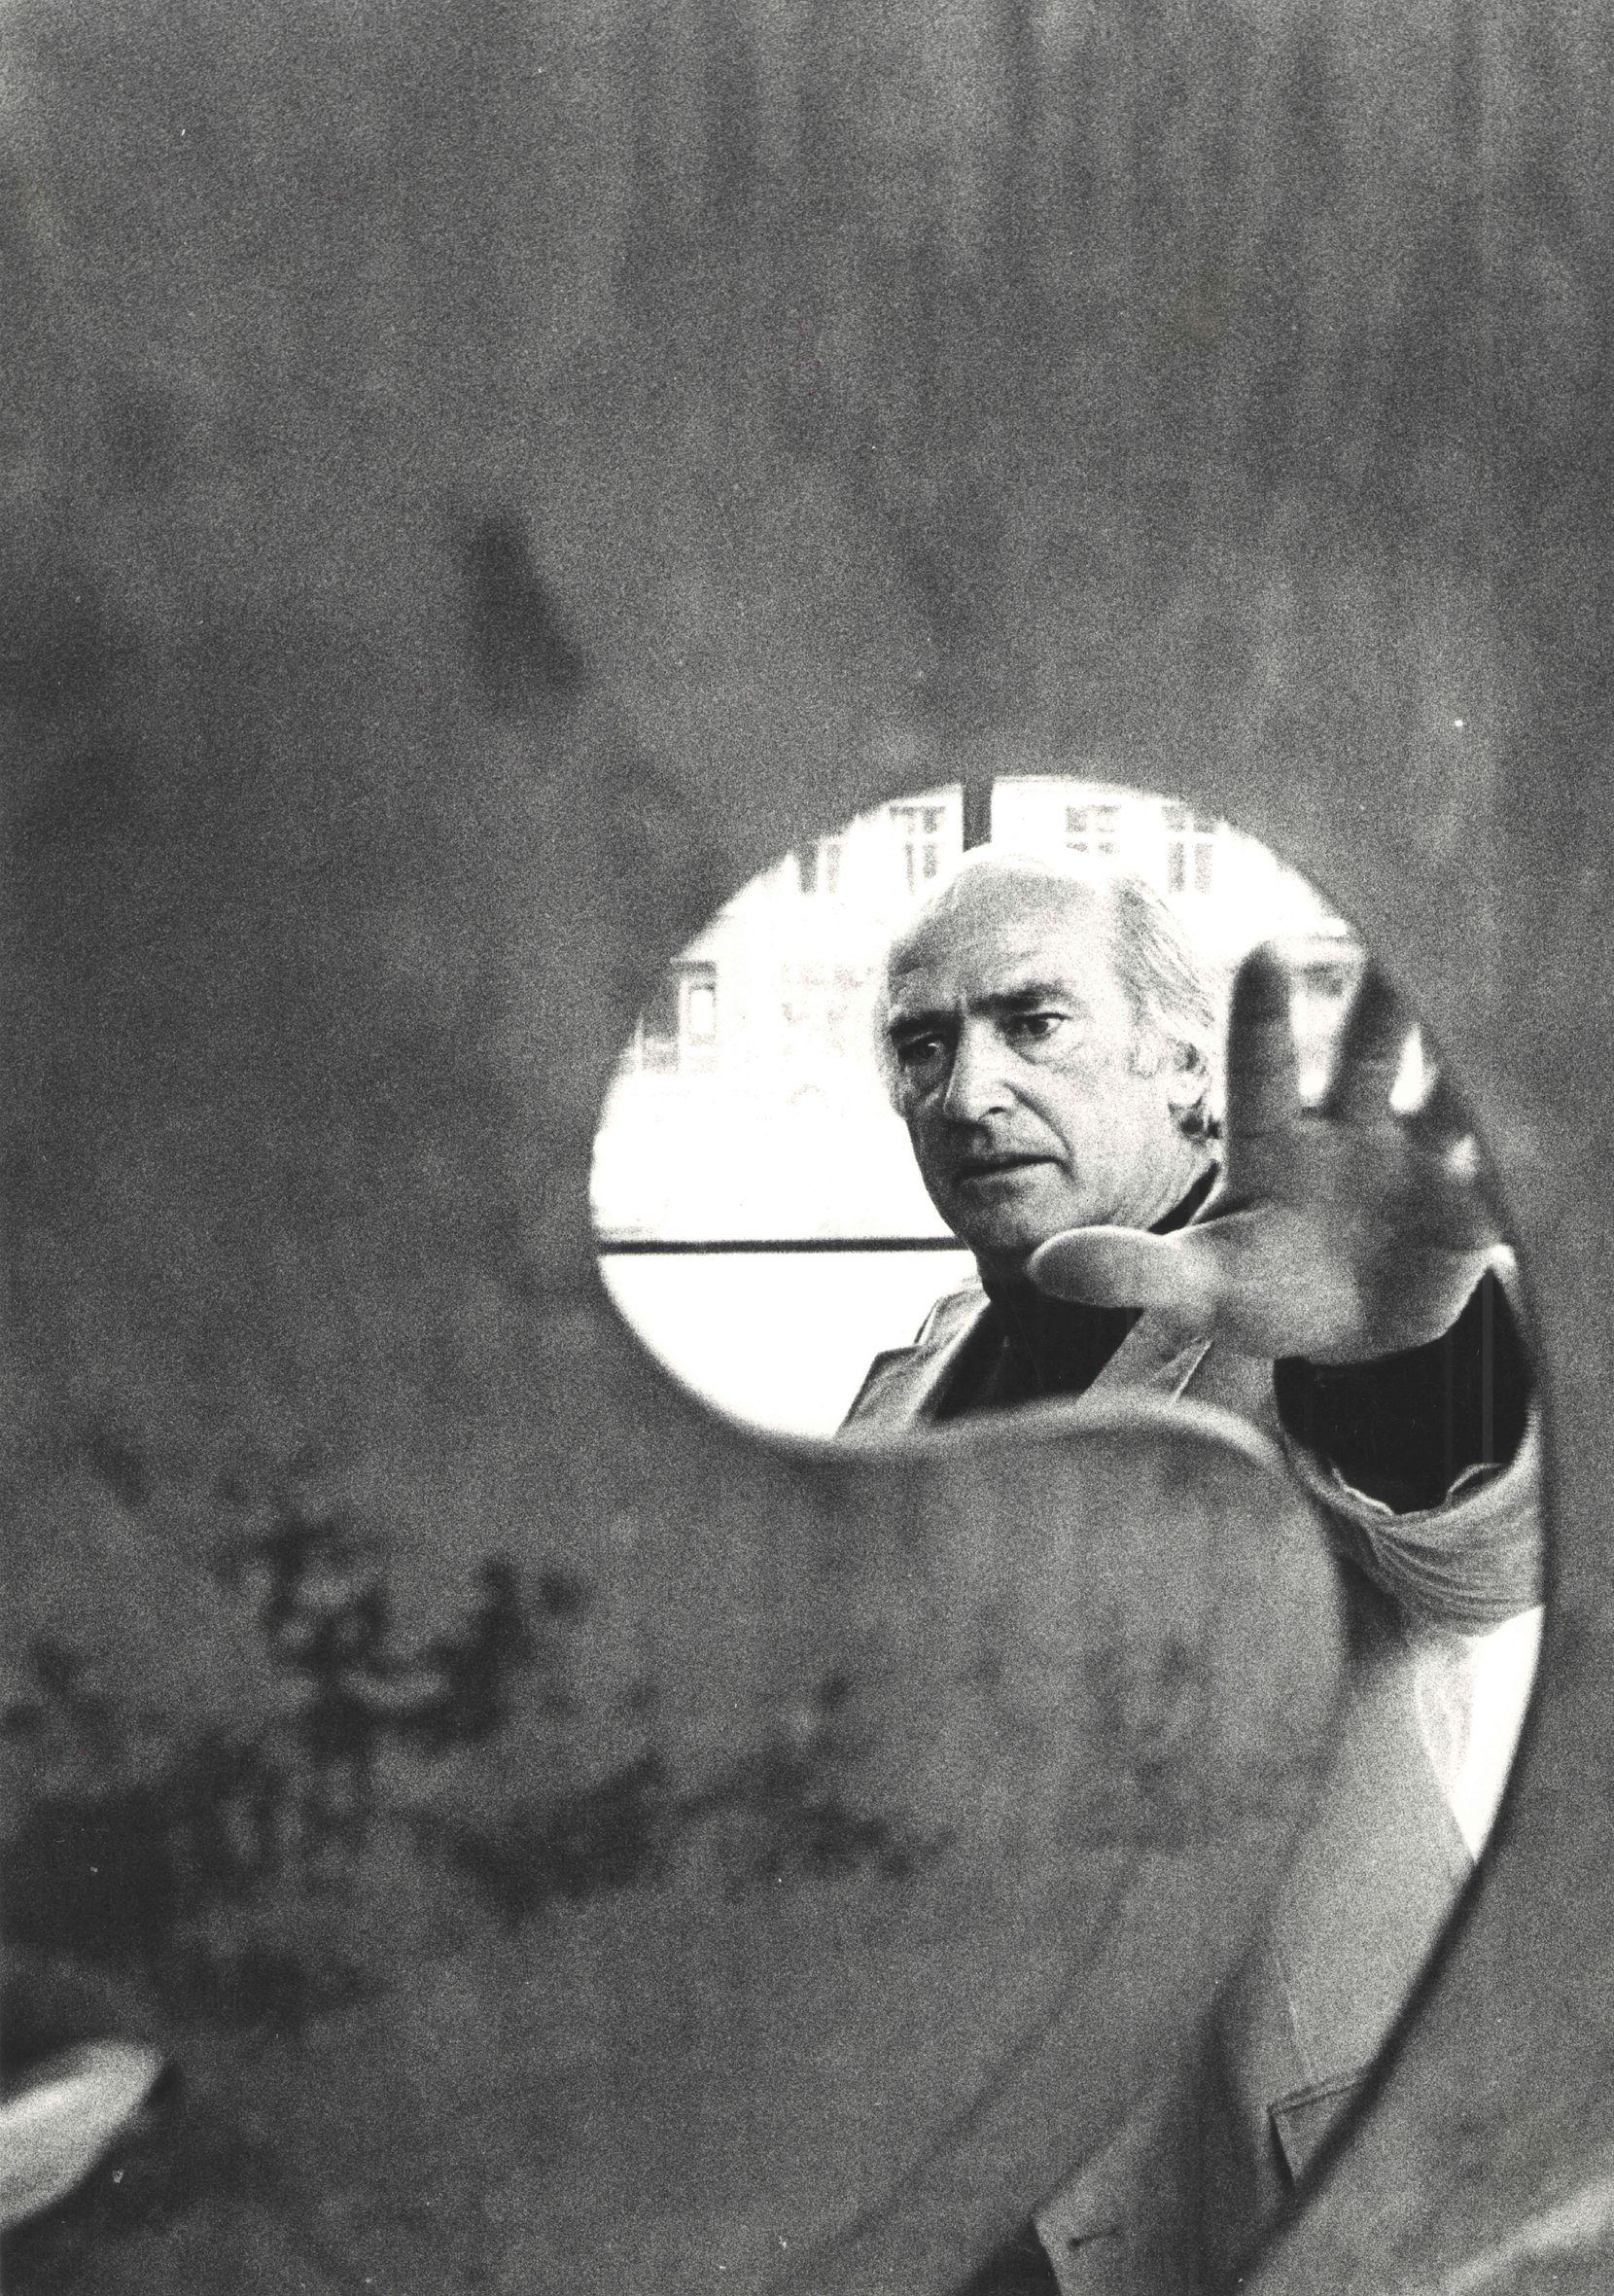 Harry Bertoia, c. 1970s. Photo: courtesy Harry Bertoia Foundation and the Nasher Sculpture Center